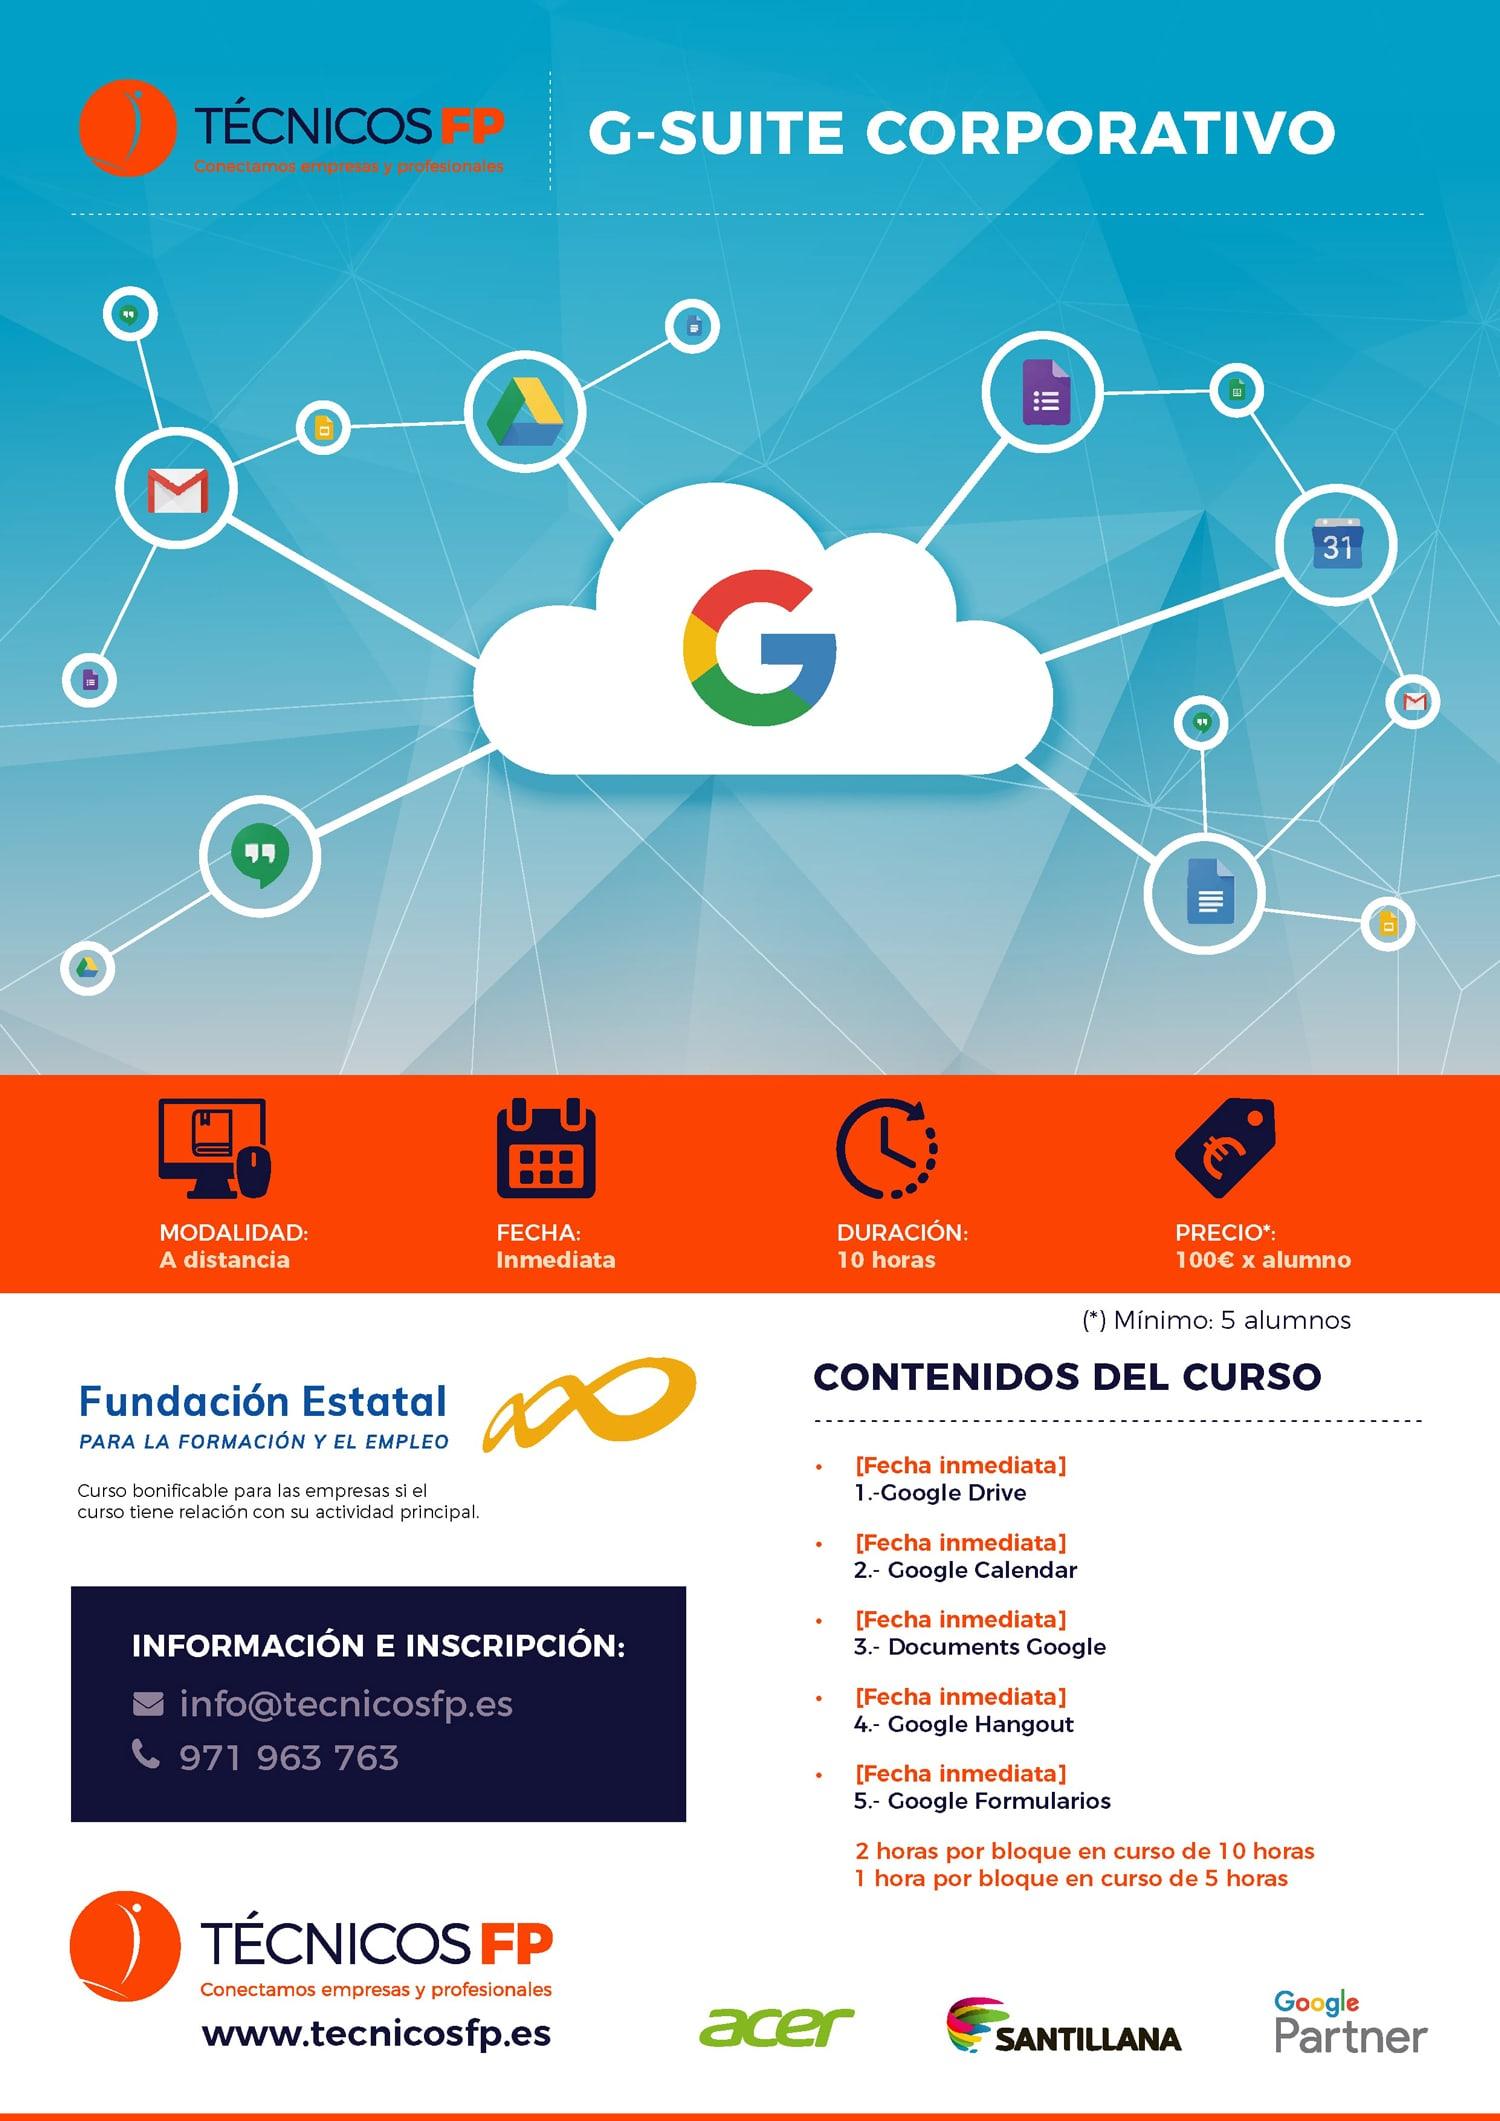 Técnicos FP - Promo - curso Google Suite For Education Corporativo